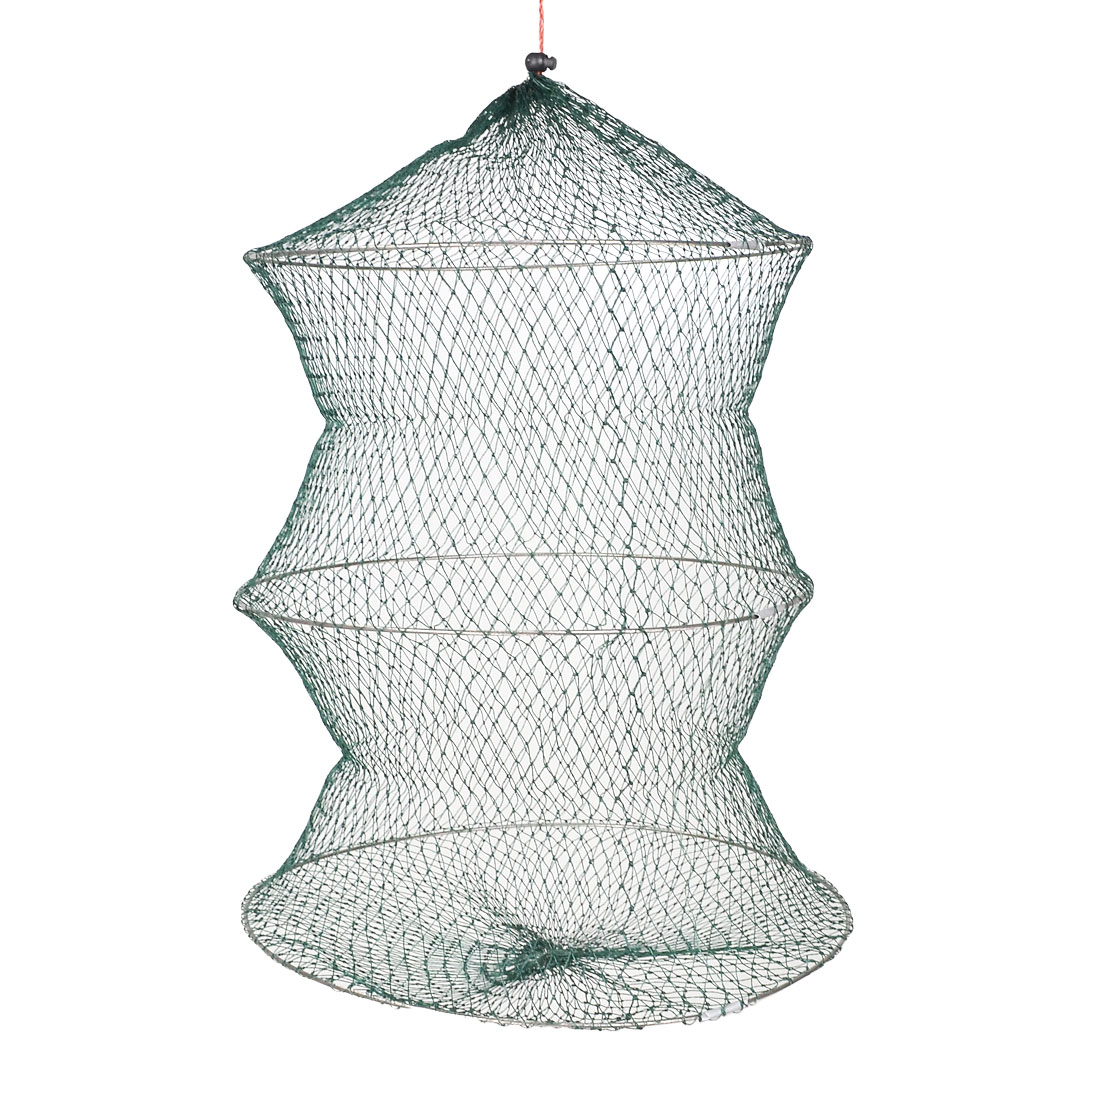 Green Mesh Fishing Netting 2-Layer Fish Lobster Shrimp Crab Net